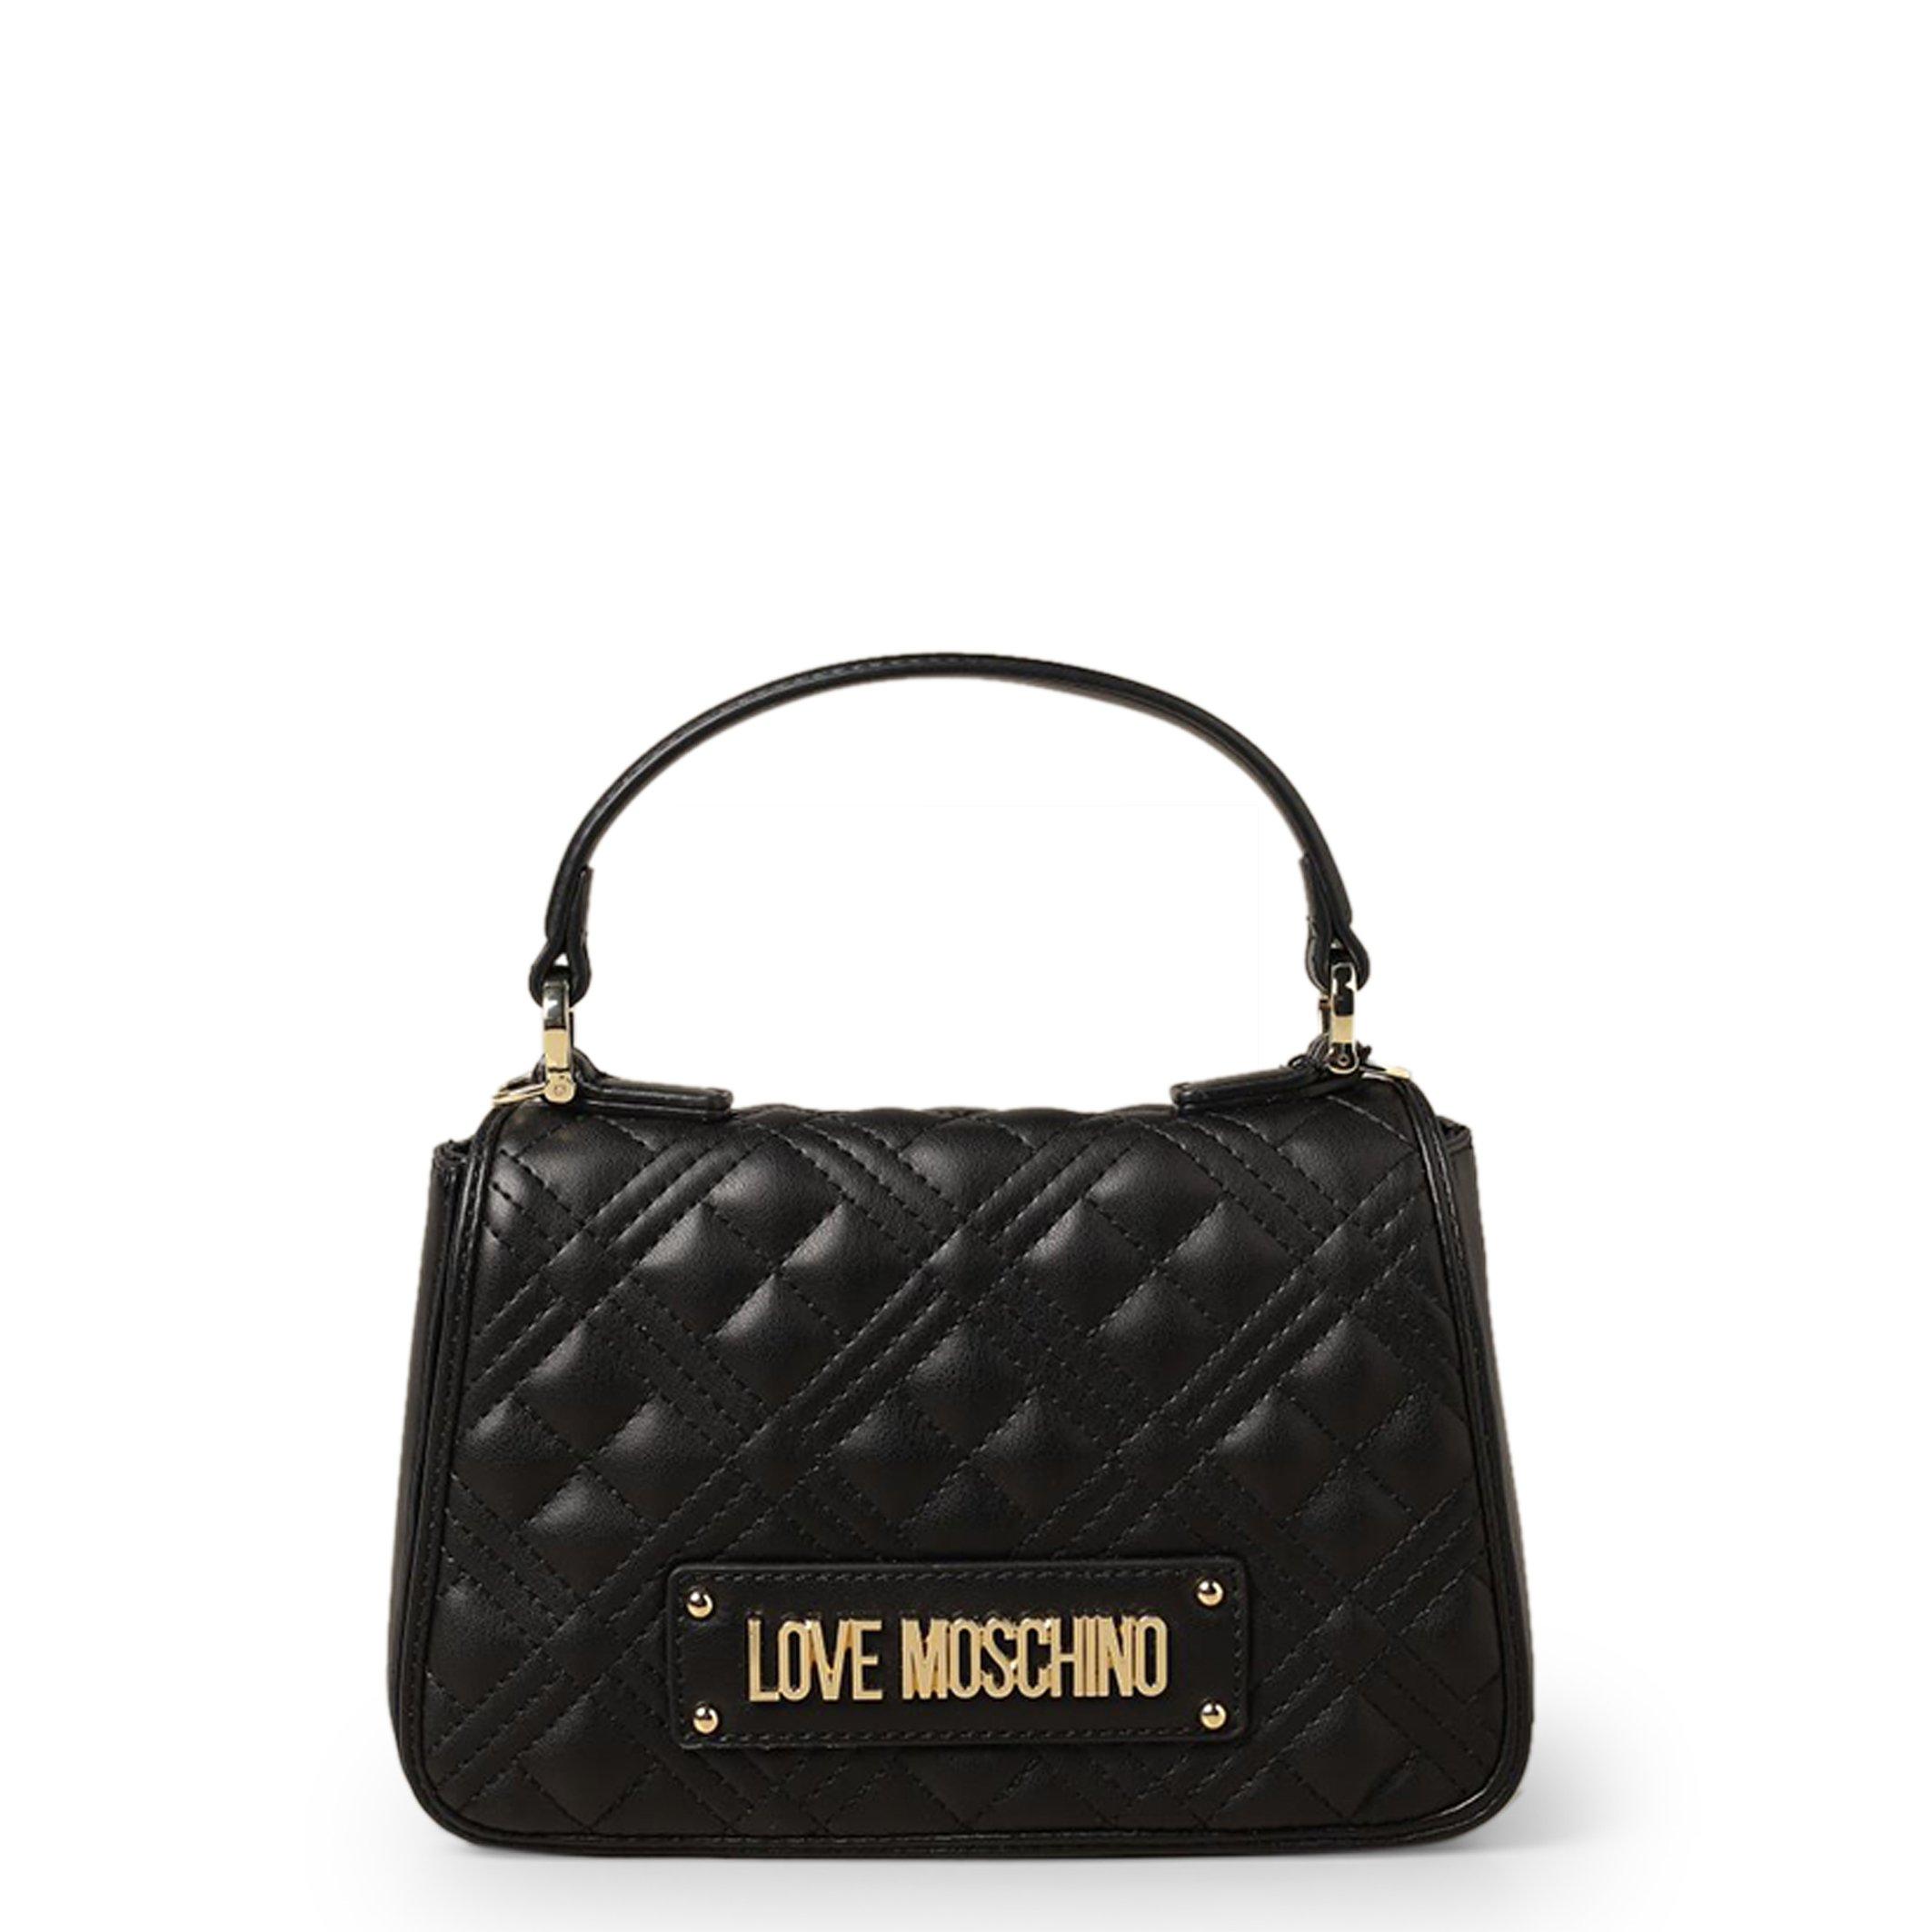 Love Moschino Women's Handbag Various Colours JC4202PP0CKA0 - black NOSIZE